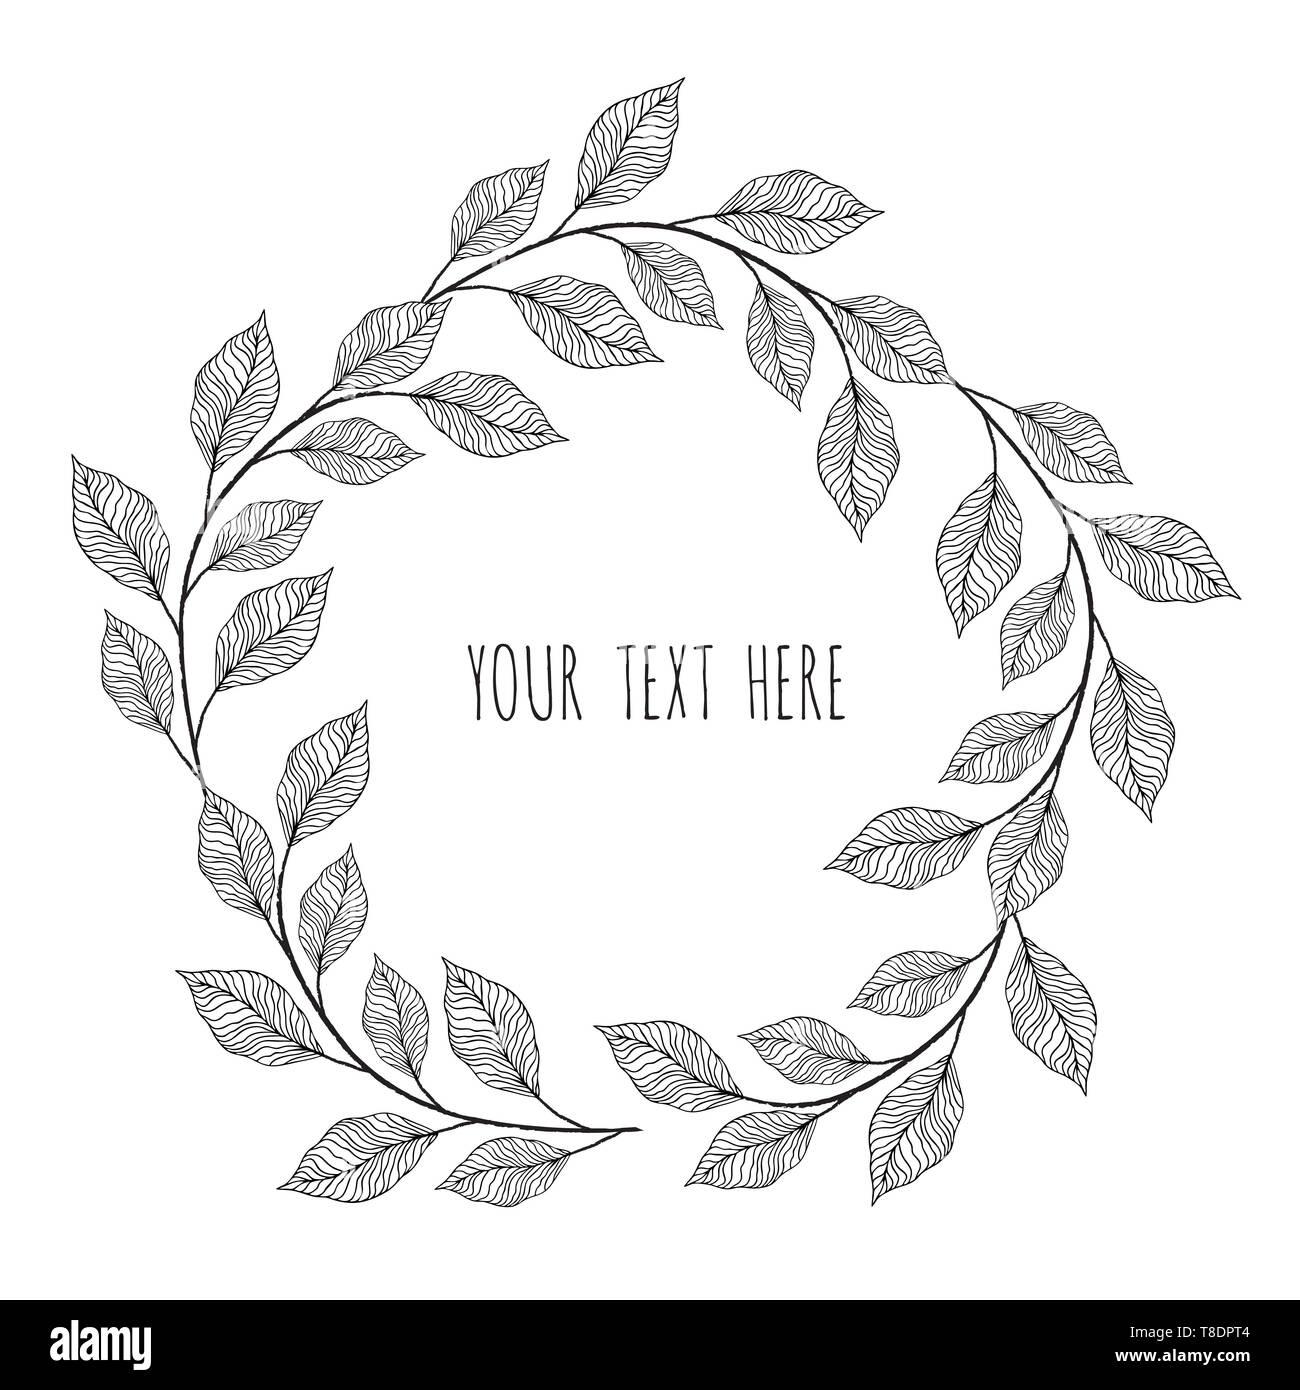 designer elements set collection of greeng leaves herbs - Stock Image